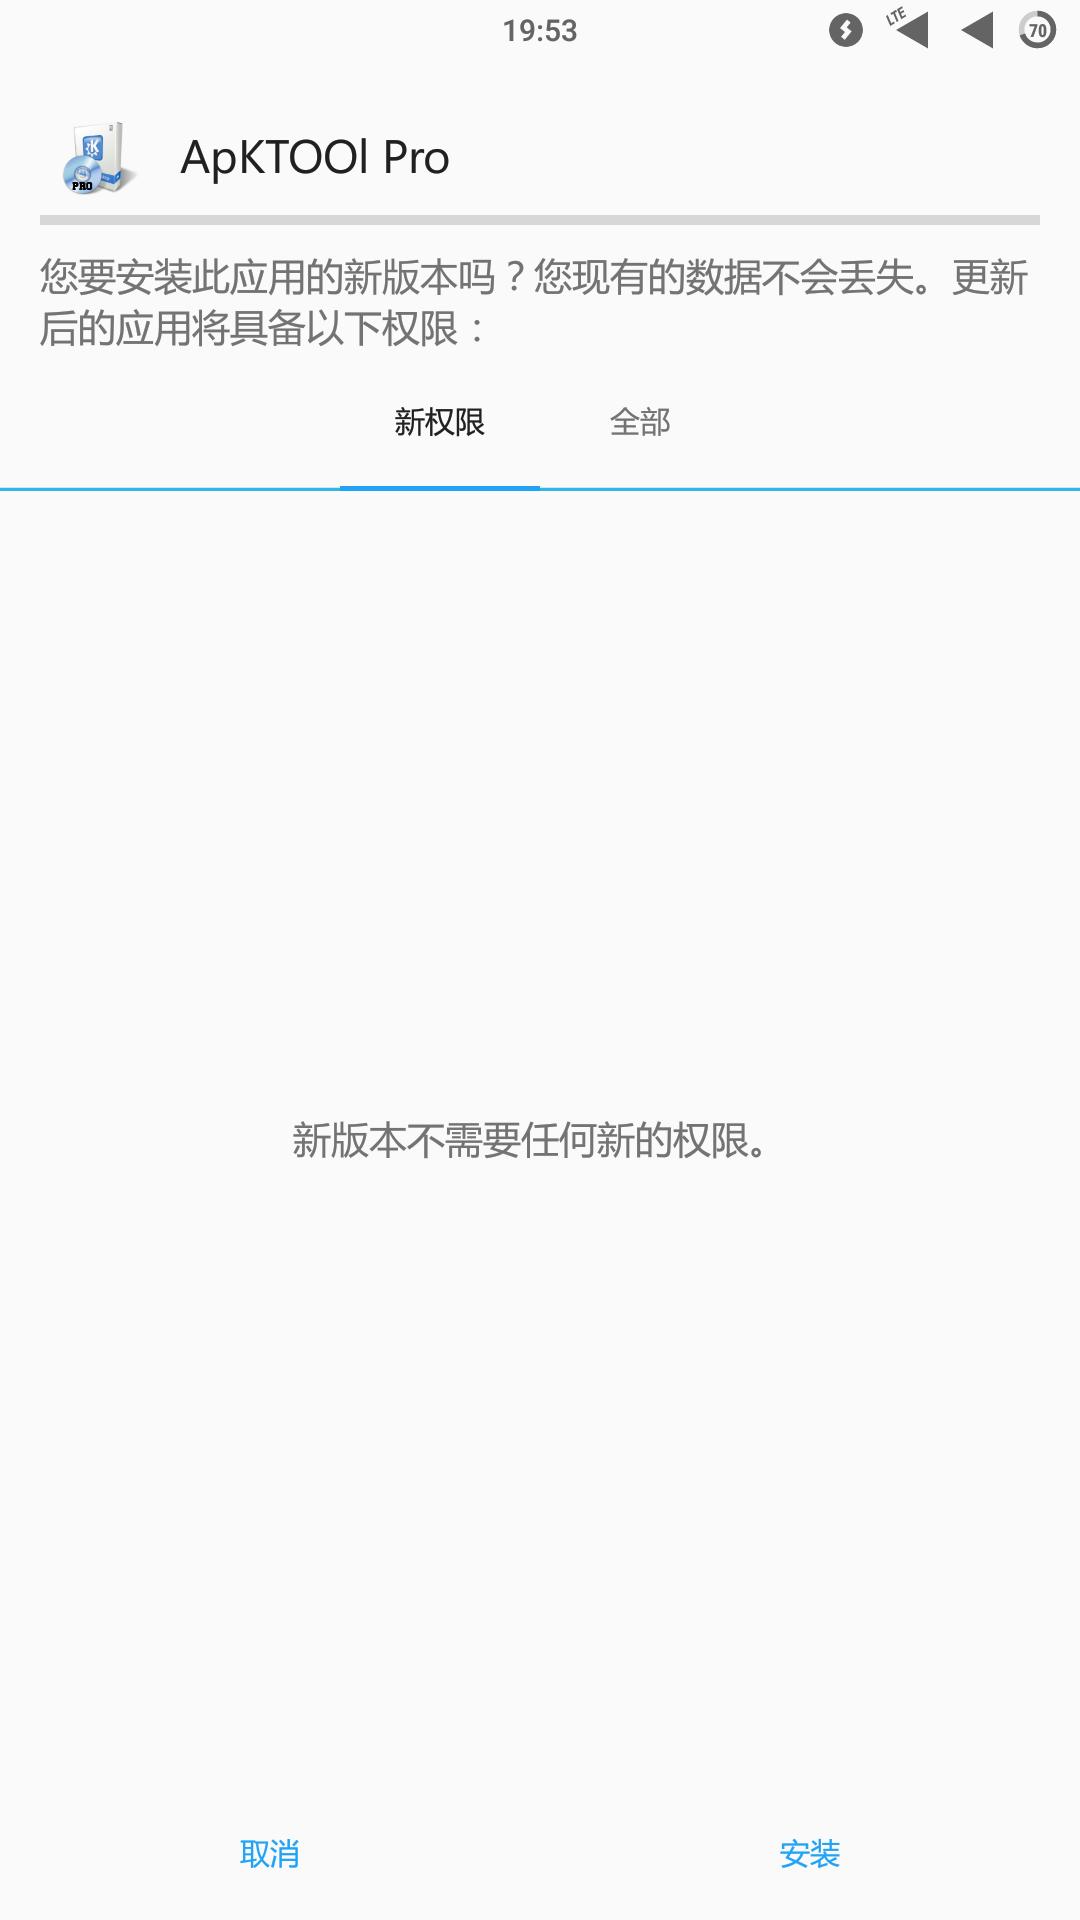 Screenshot_20160605-195307.png